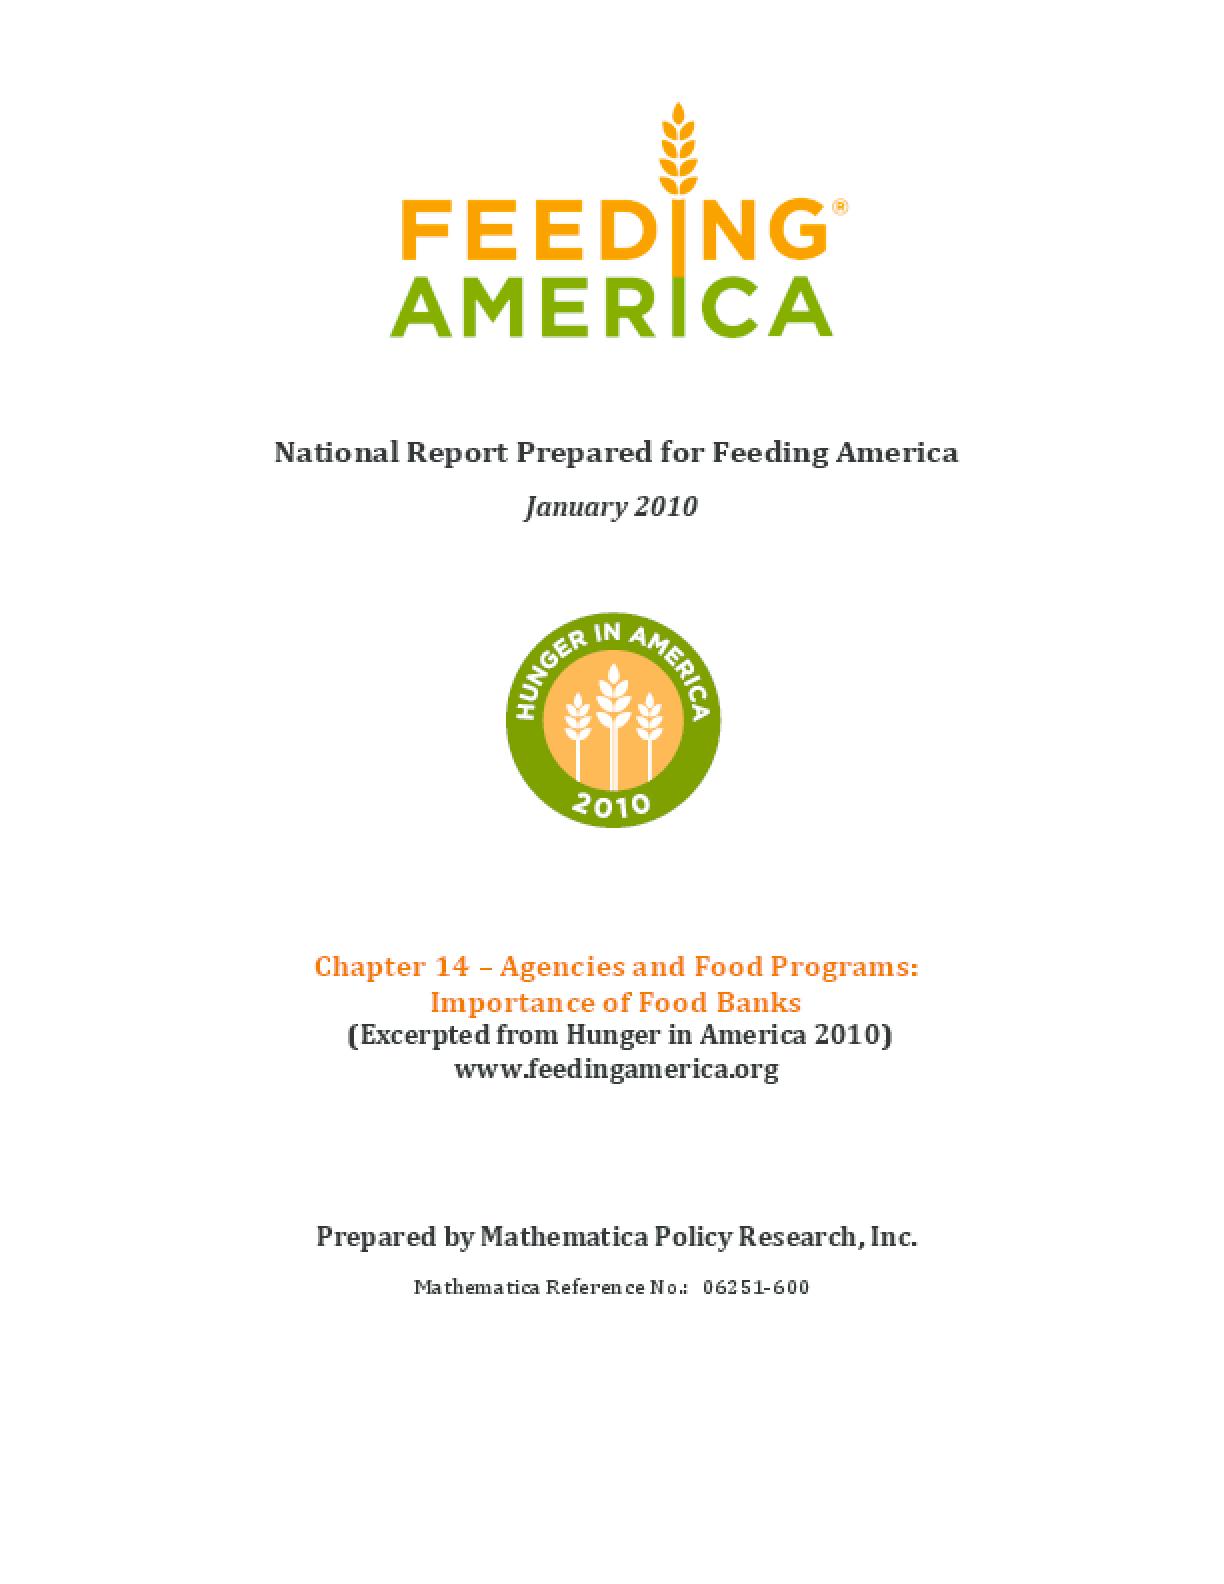 Feeding America Agencies and Food Programs: Importance of Food Banks